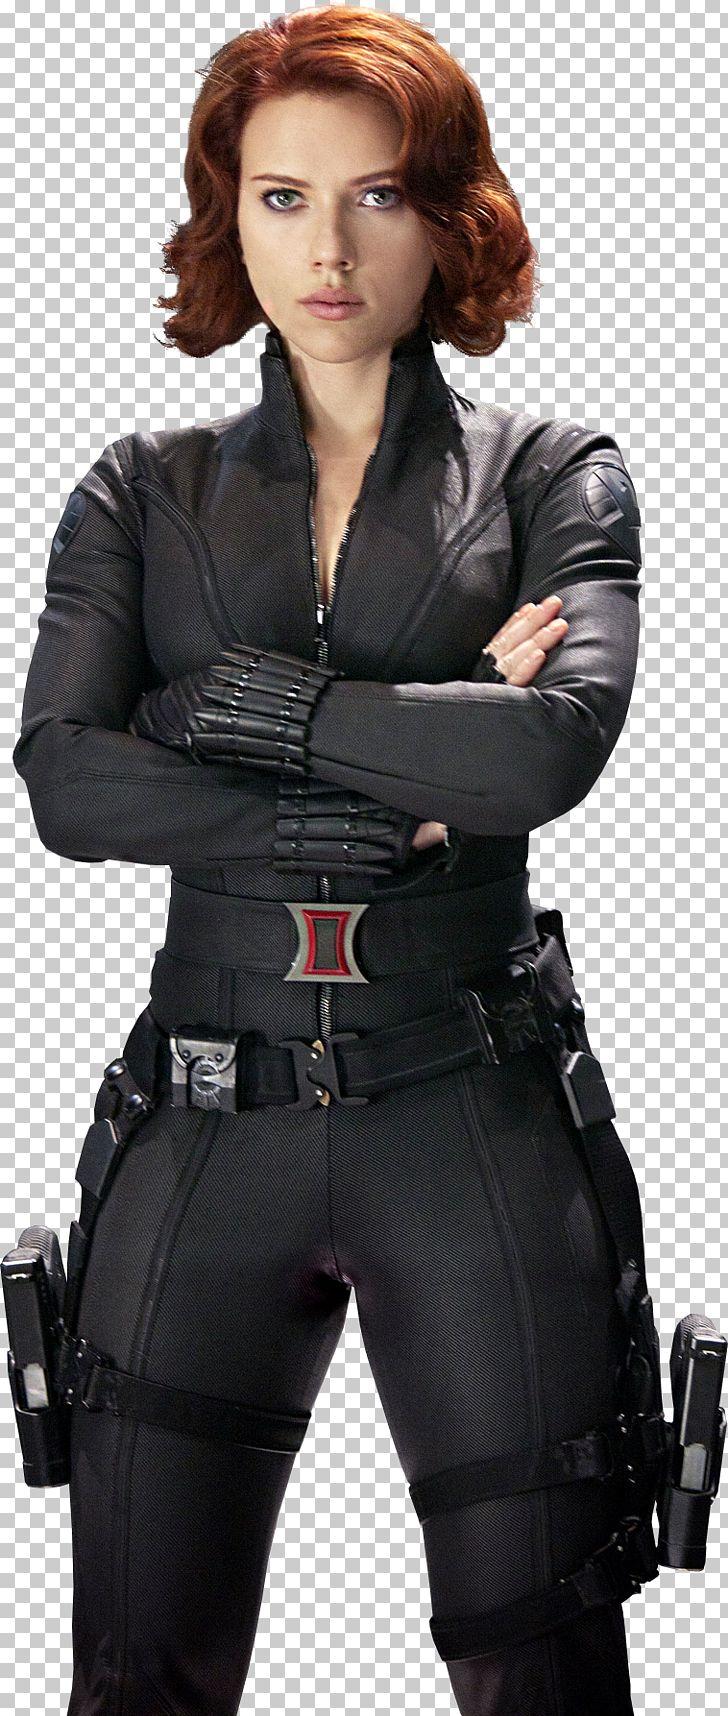 Scarlett Johansson Black Widow The Avengers Cosplay Costume